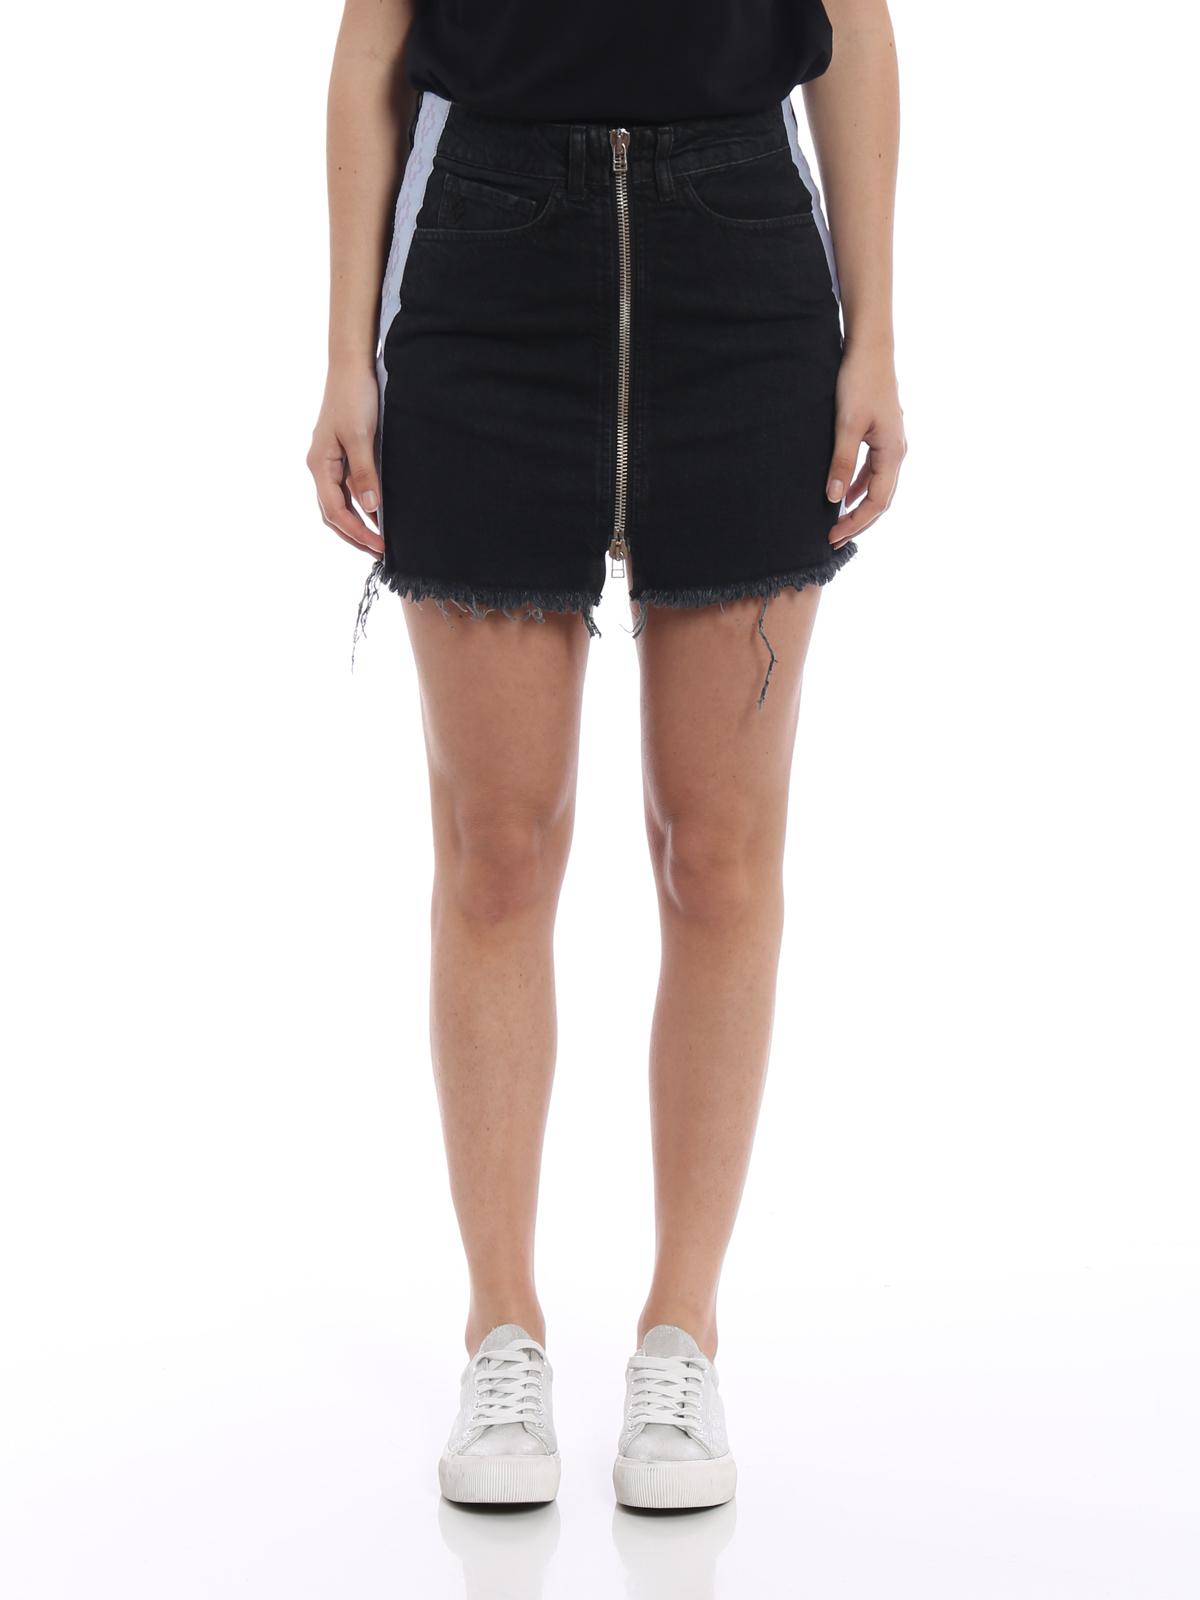 Cross tape denim skirt - Black Marcelo Burlon Cheap Sale For Nice Clearance Shop For WbW9bWYj8C